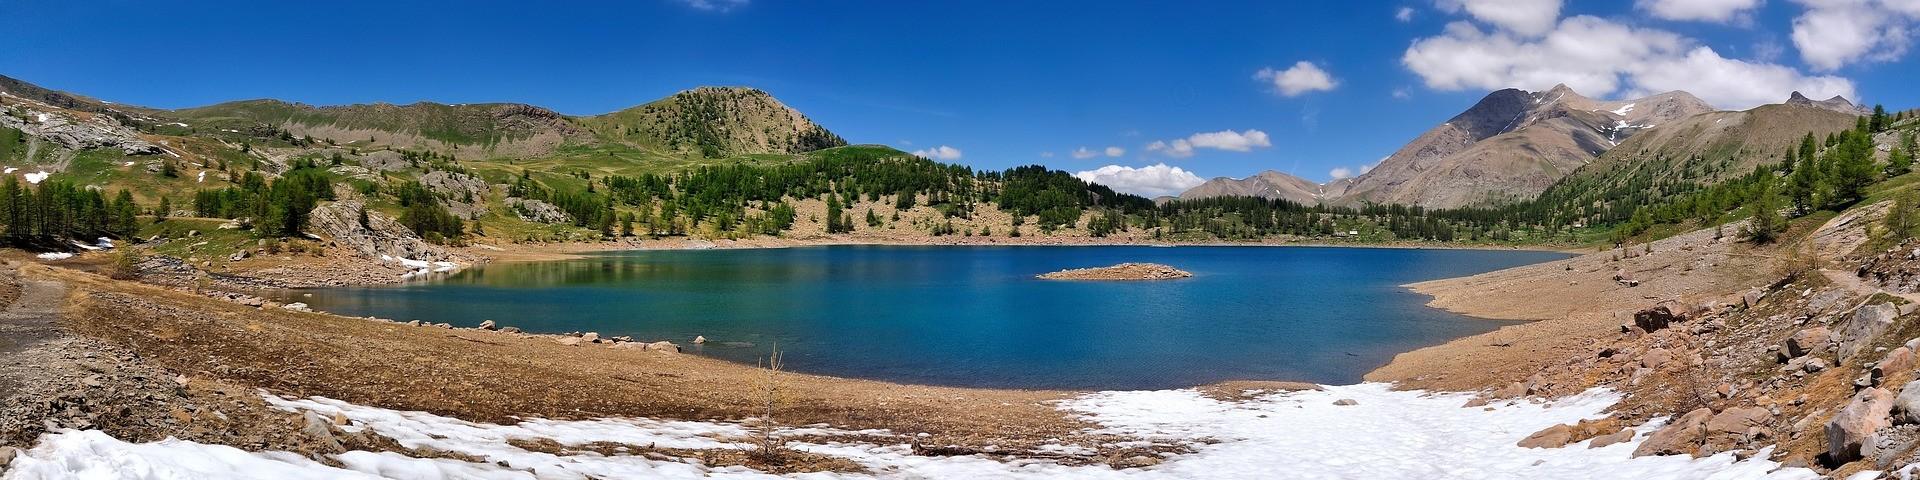 Beautiful lake in Mercantour